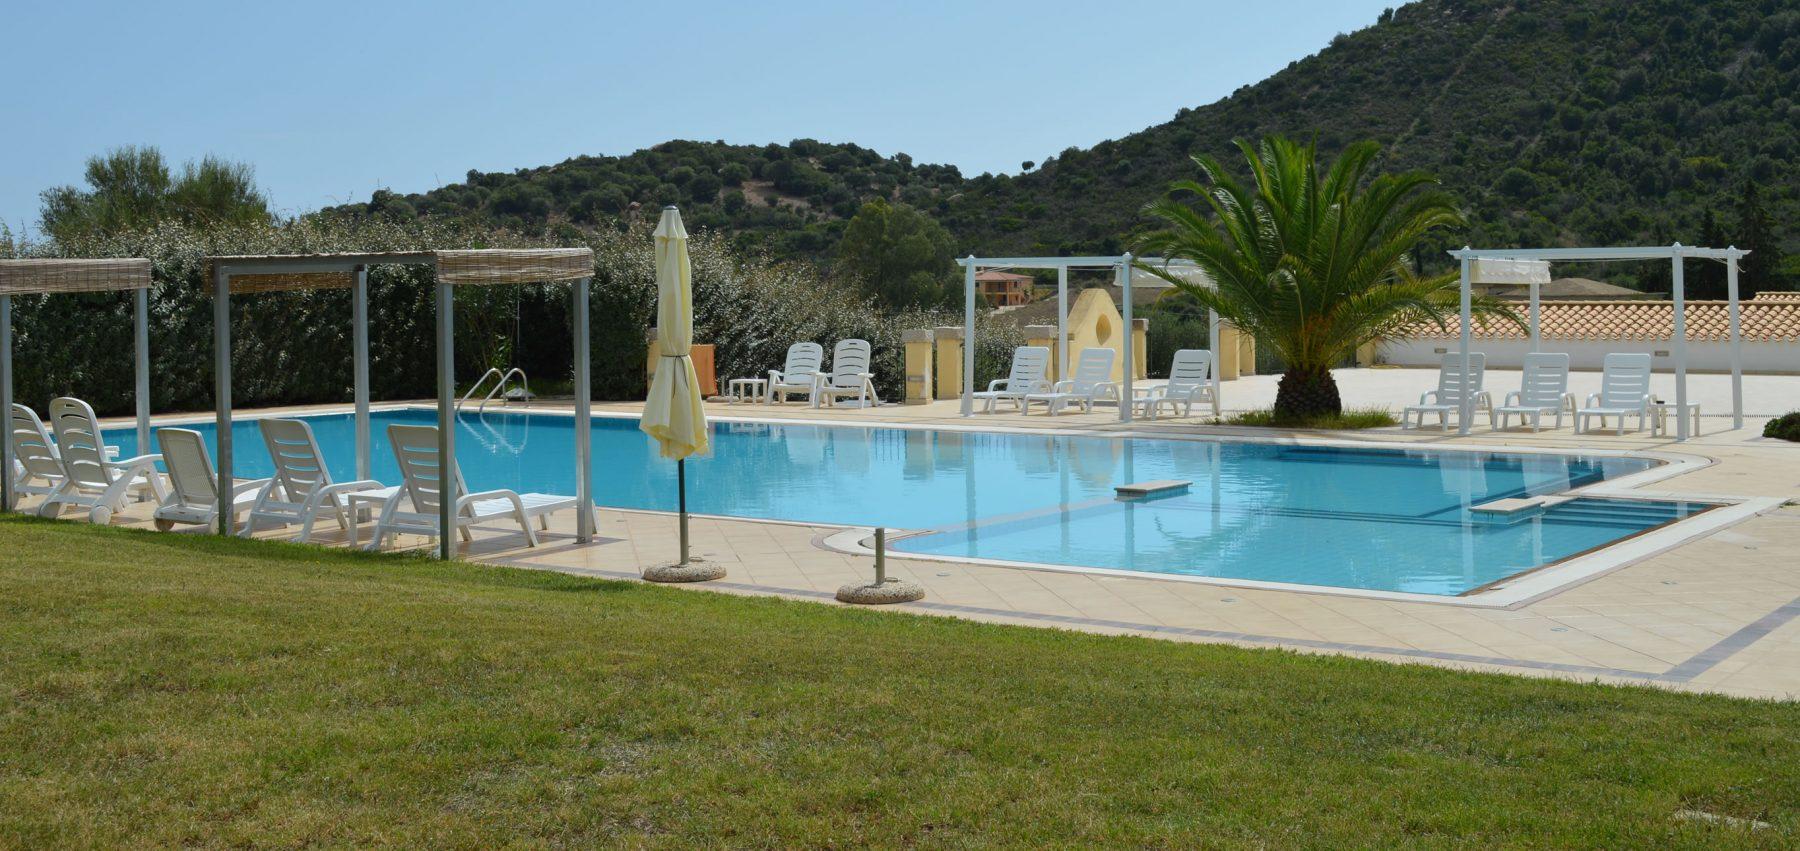 hotel-cardedu-ogliastra-sardegna-la-piscina3